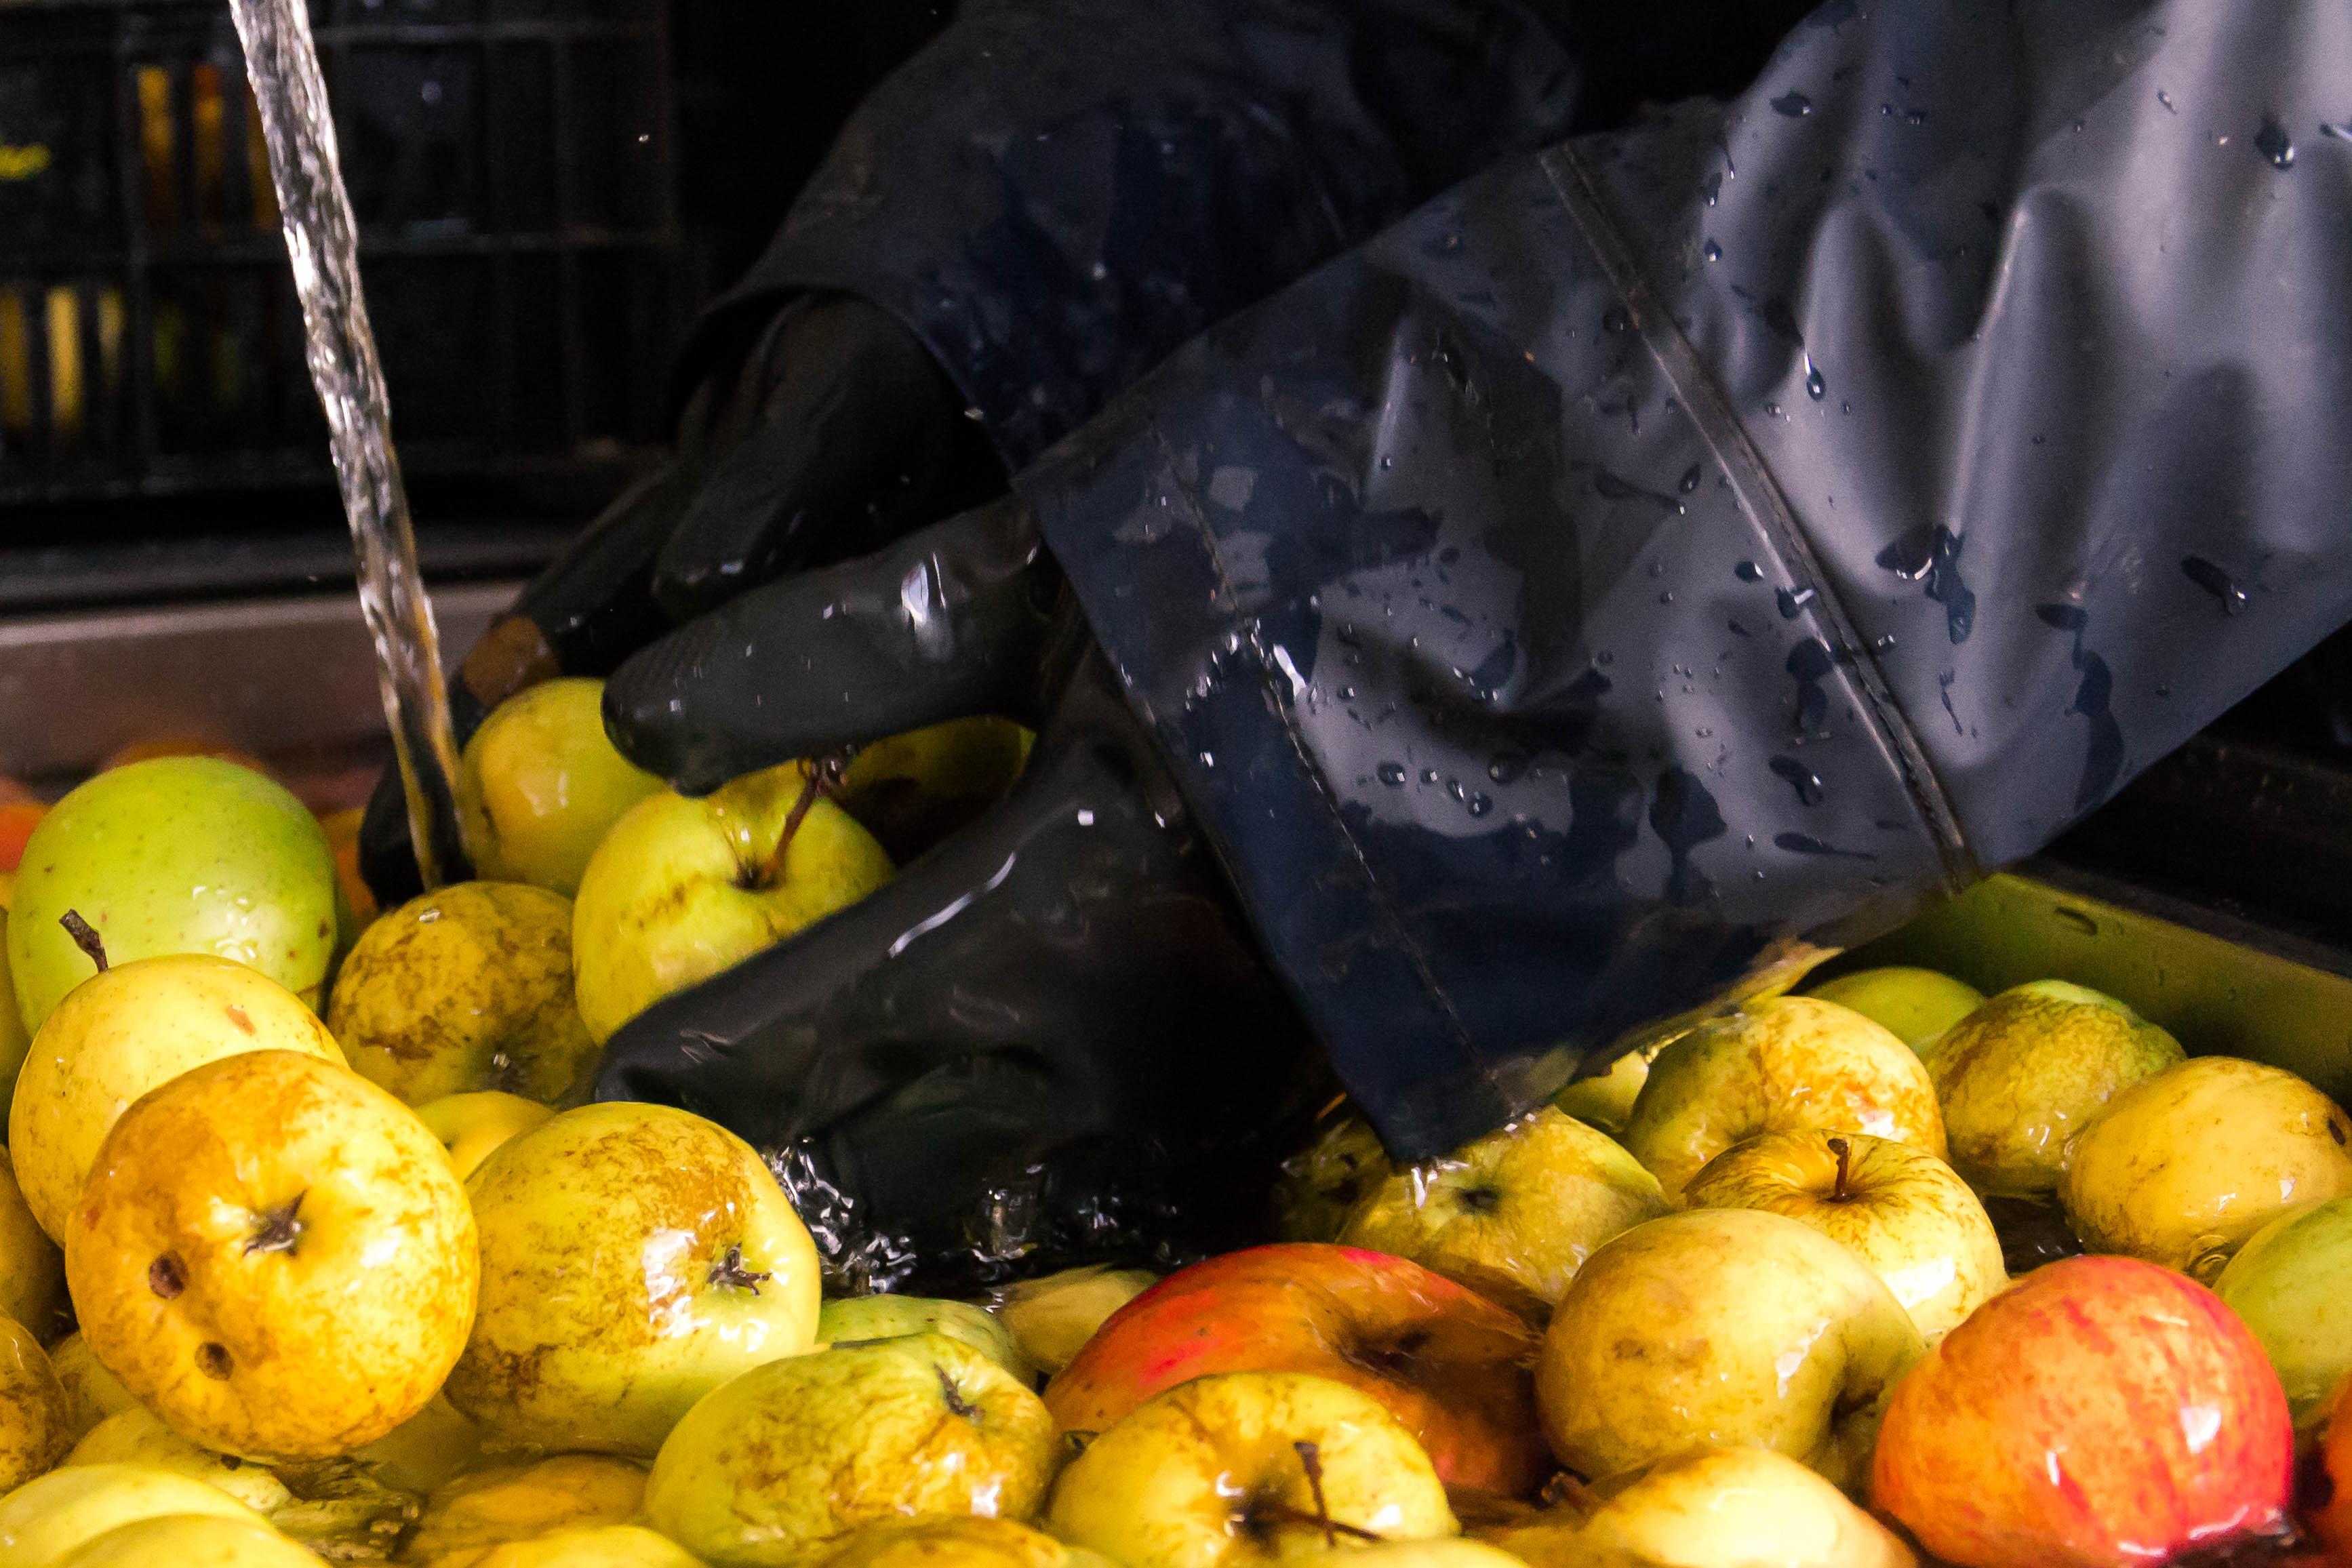 Vengono lavate le mele